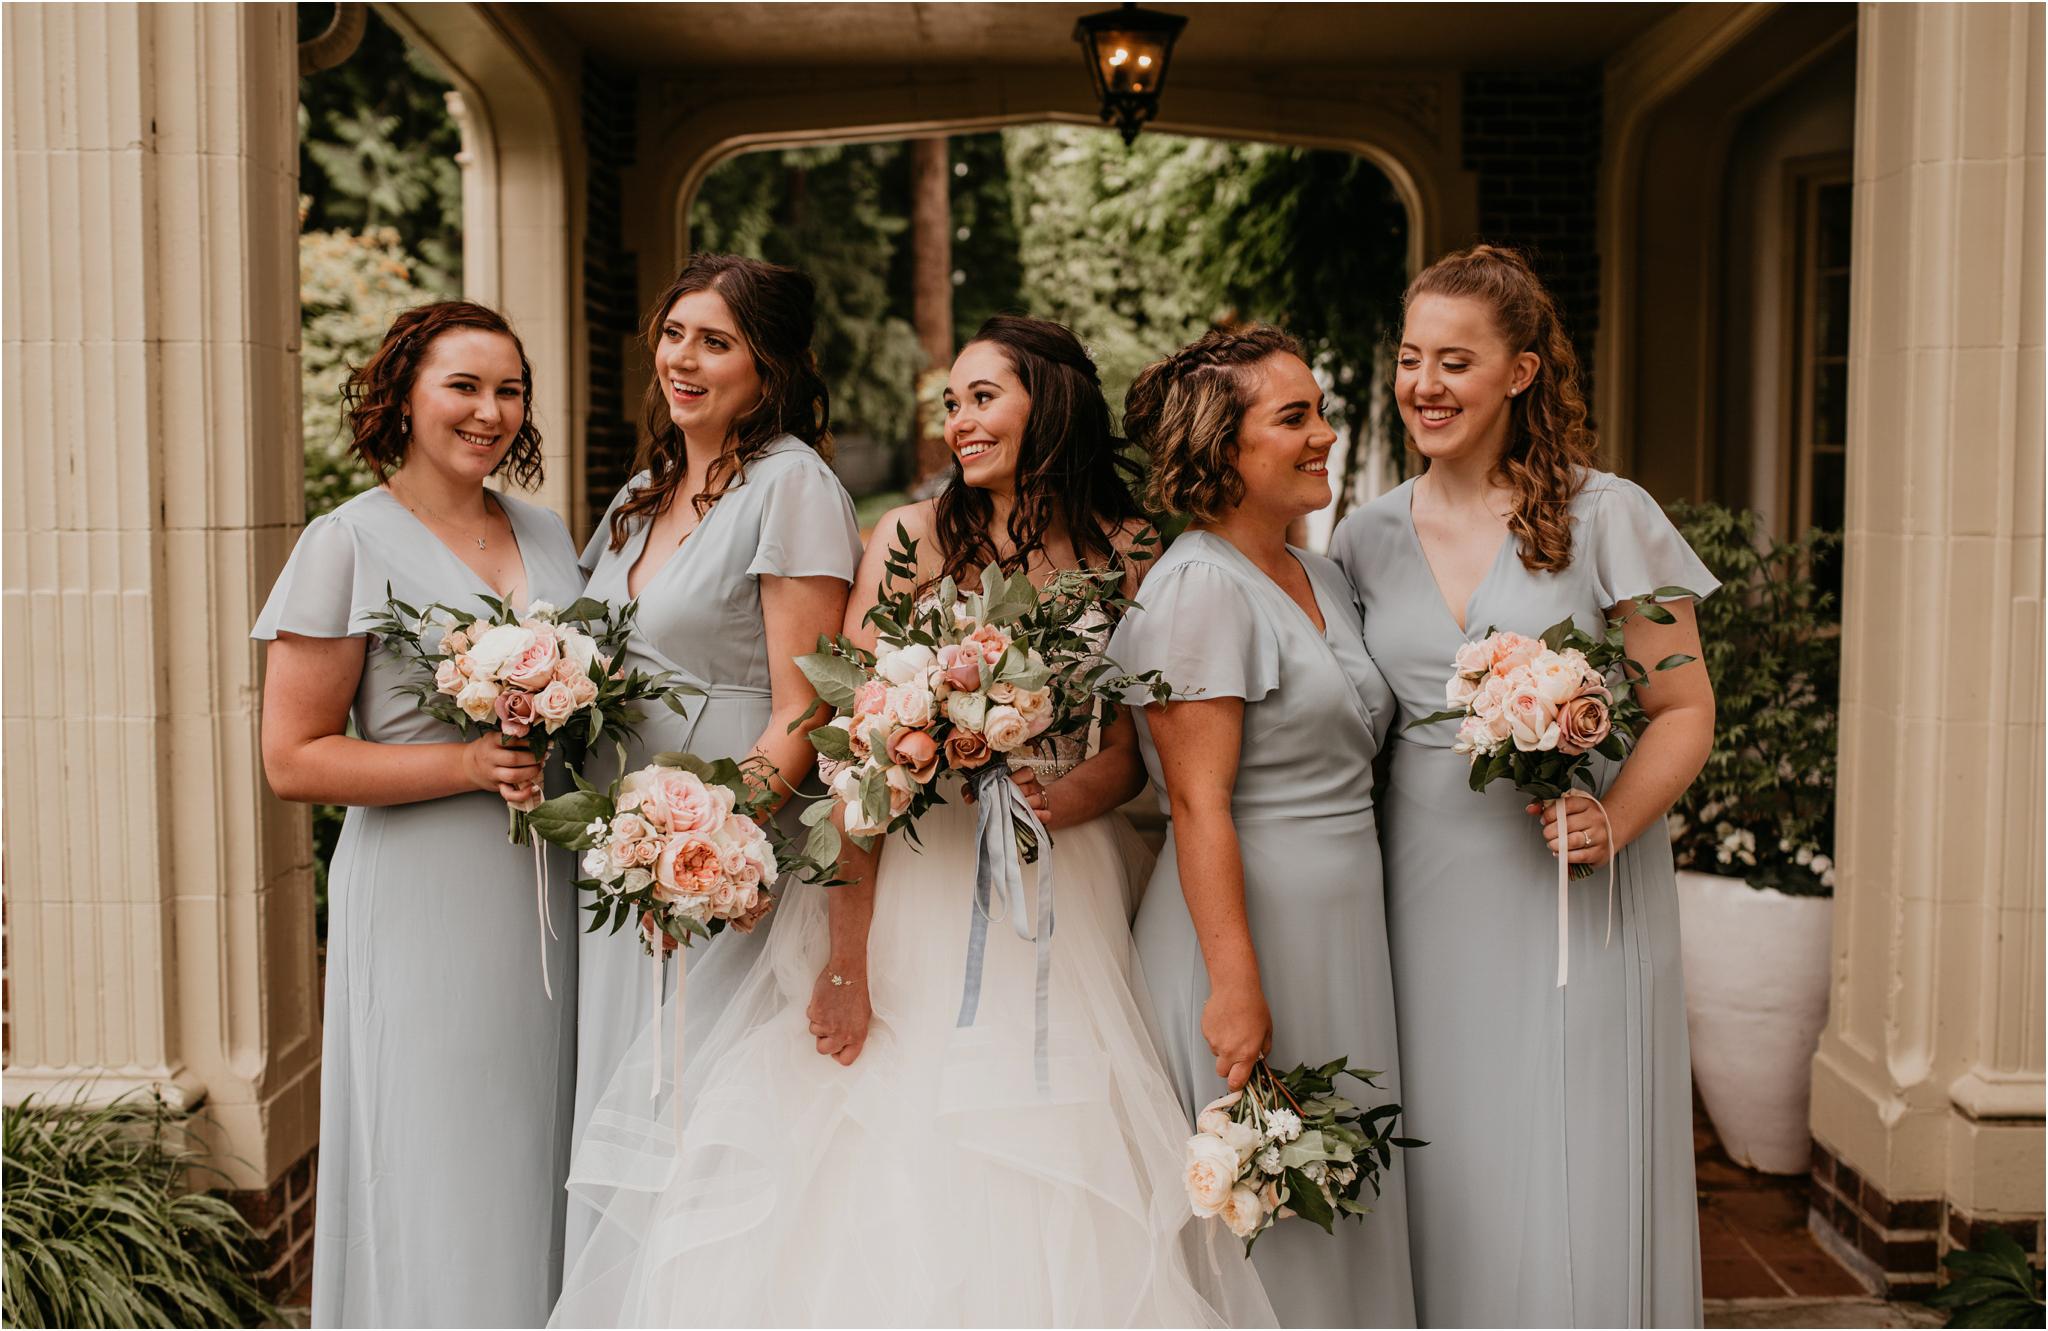 chance-and-ondrea-lairmont-manor-wedding-seattle-photographer-060.jpg